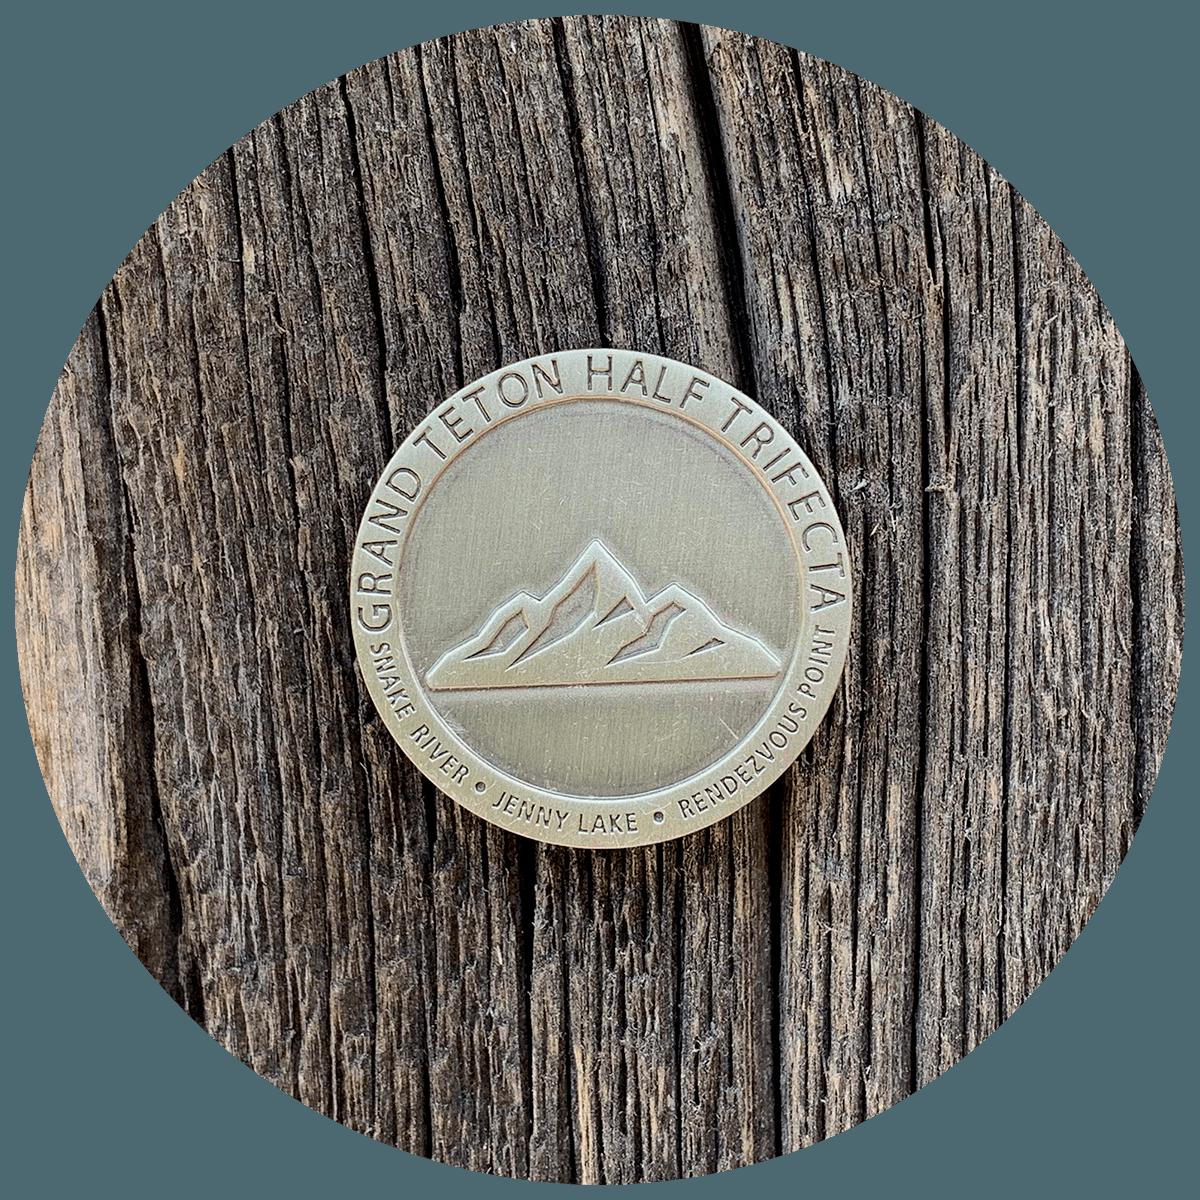 Grand Teton Trifecta Pin